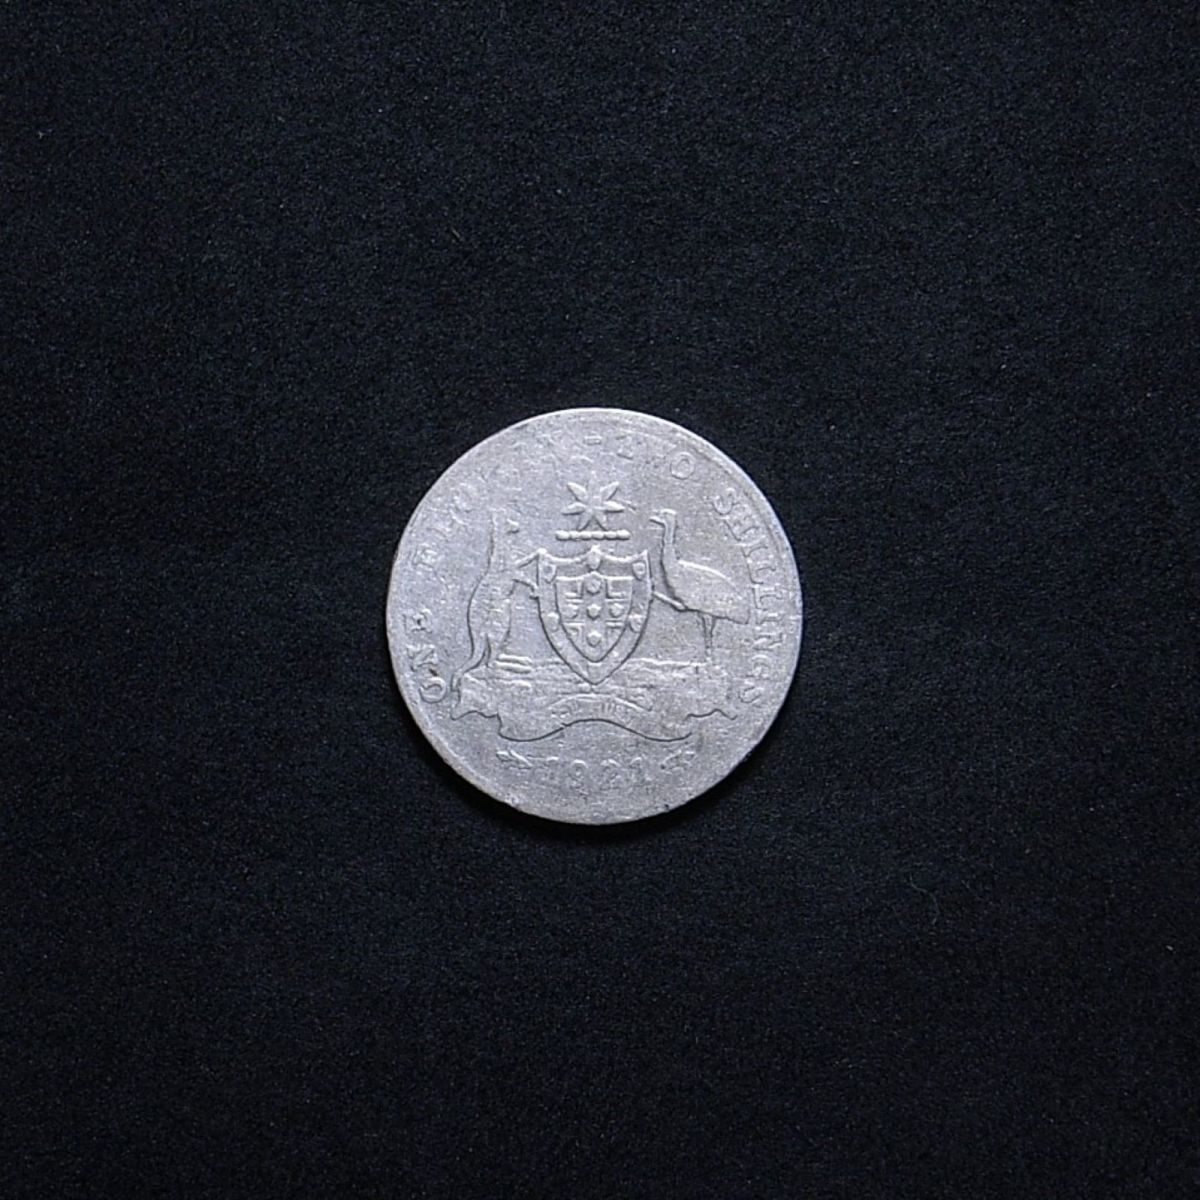 Aussie 1921 florin reverse showing remaining detail